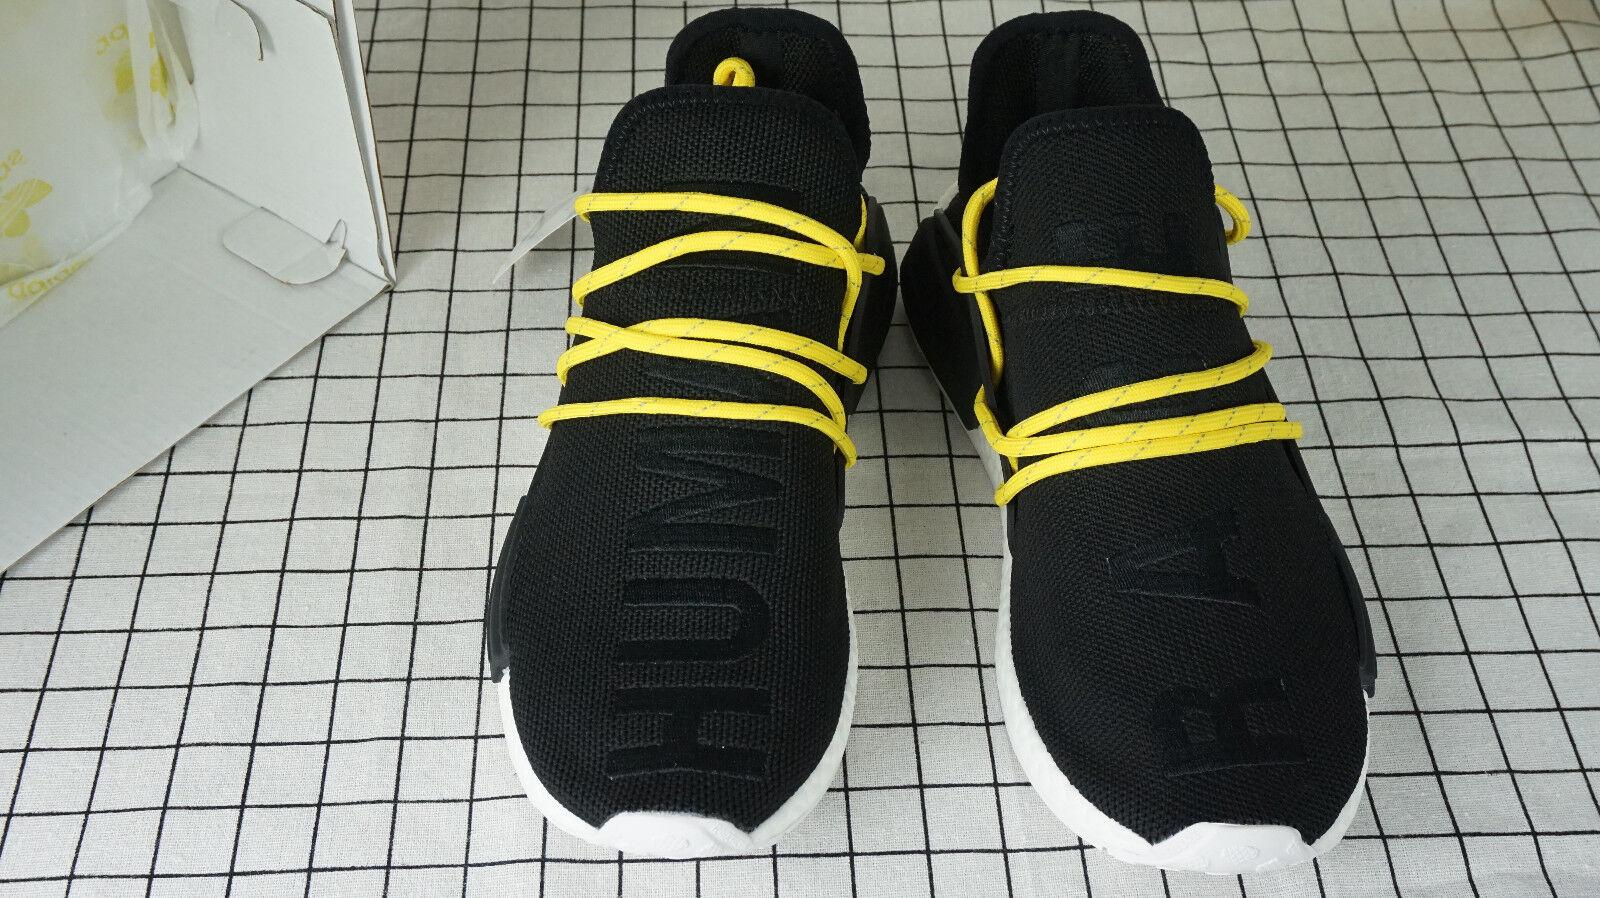 Edizione limitata adidas pharrell x adidas limitata nmd razza umana 37a858